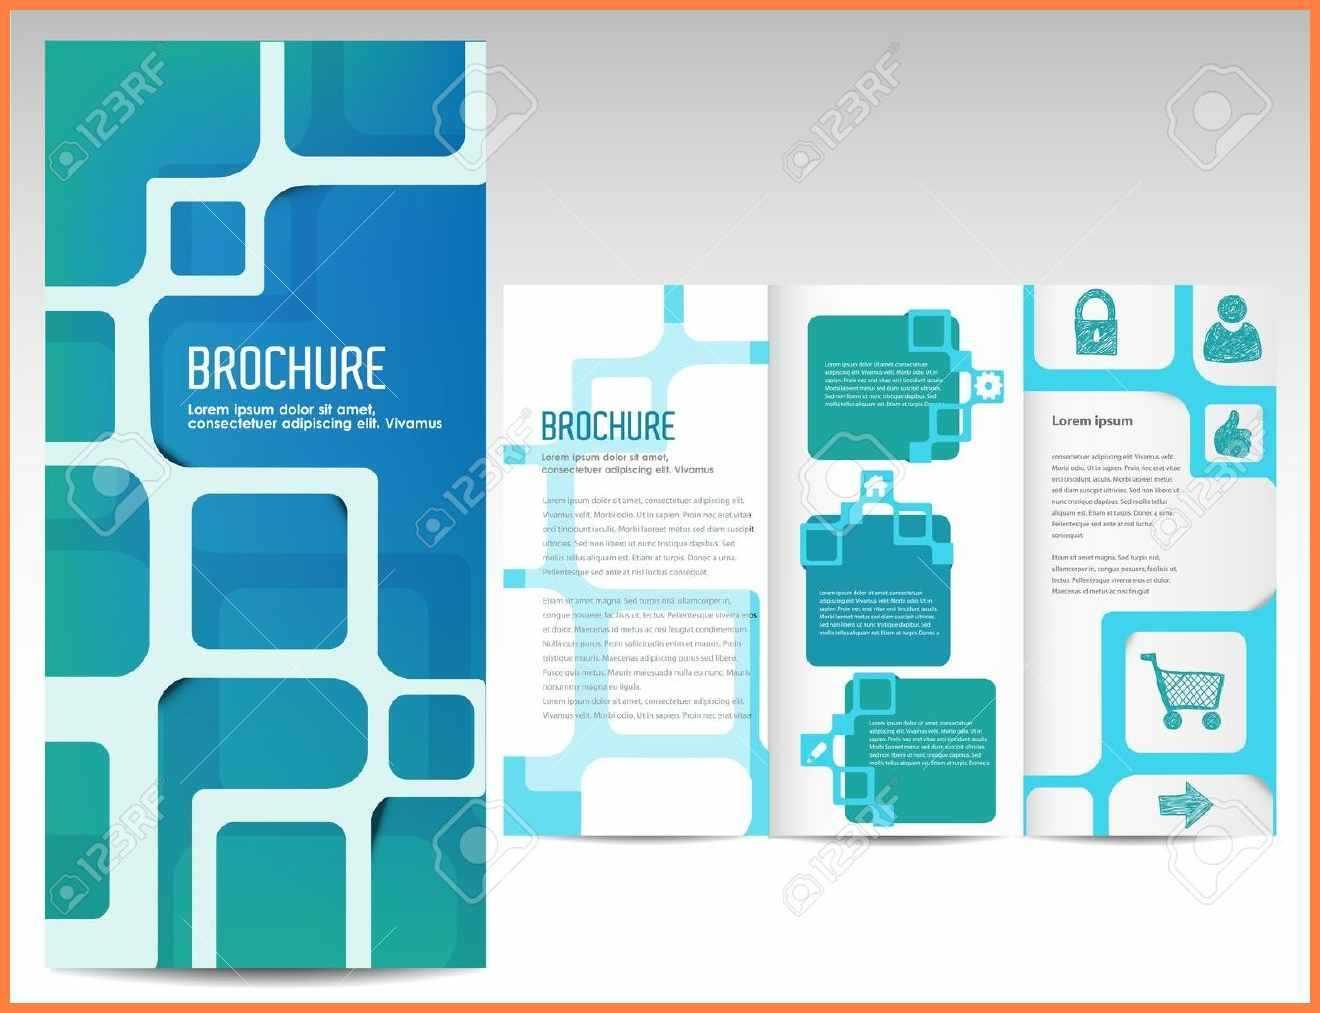 10+ Free Microsoft Word Tri Fold Brochure Templates | Andrew Regarding Microsoft Word Brochure Template Free